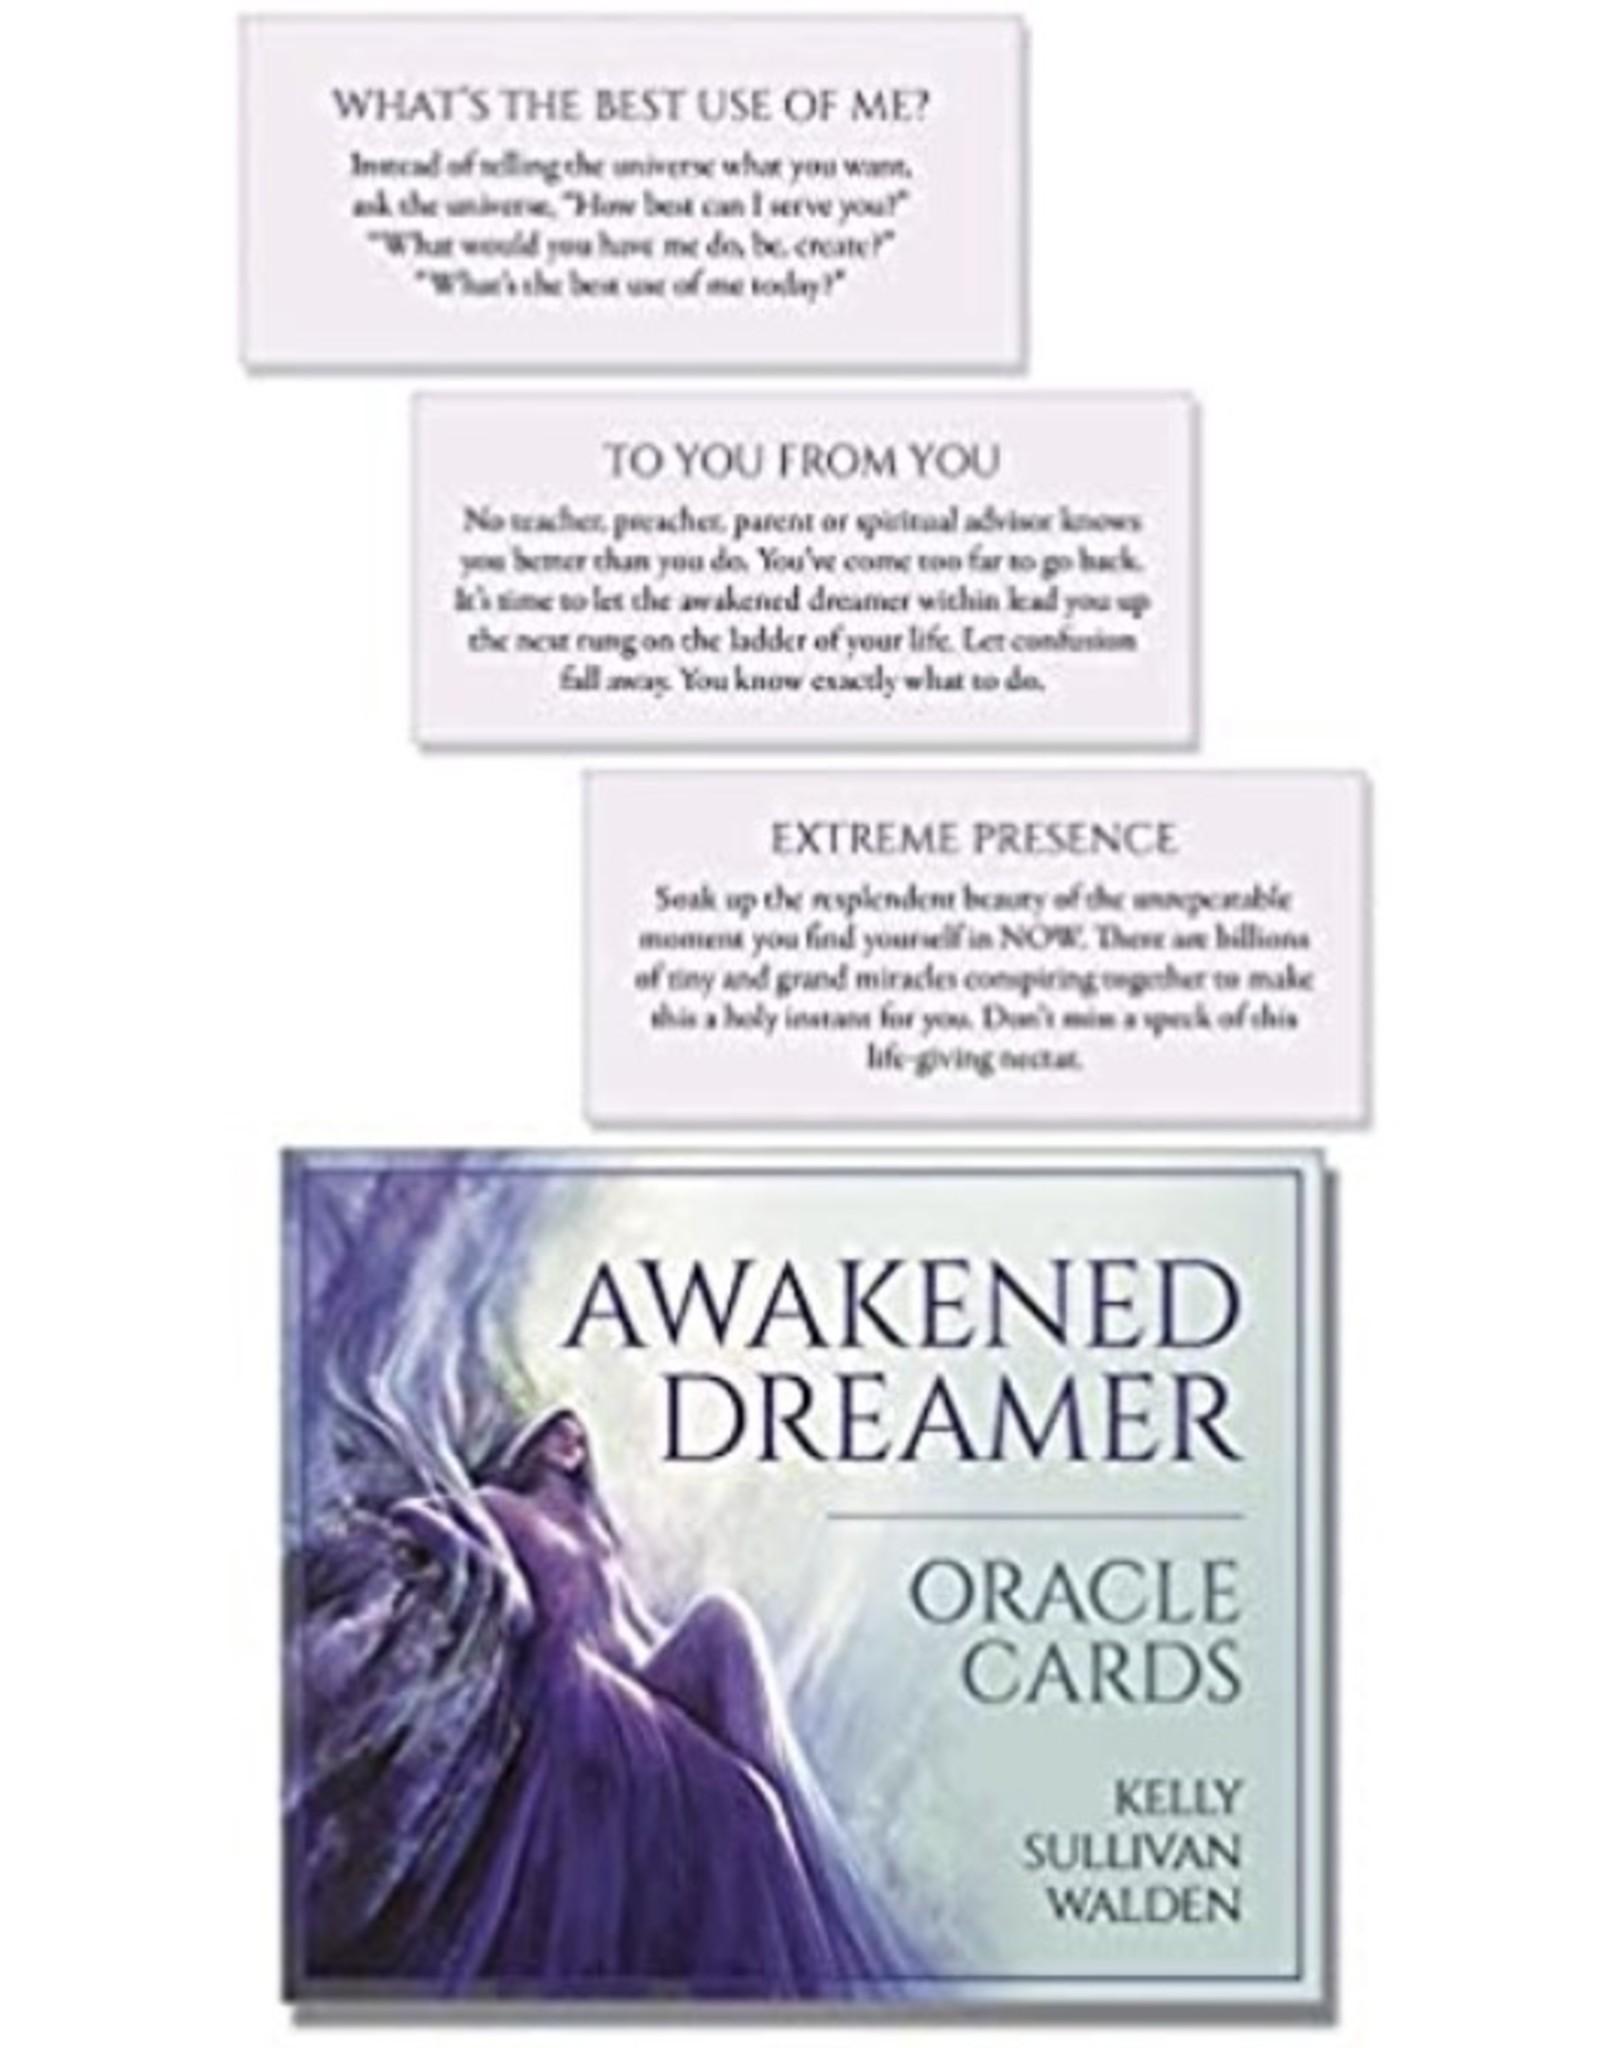 Awakened Dreamer Oracle Cards